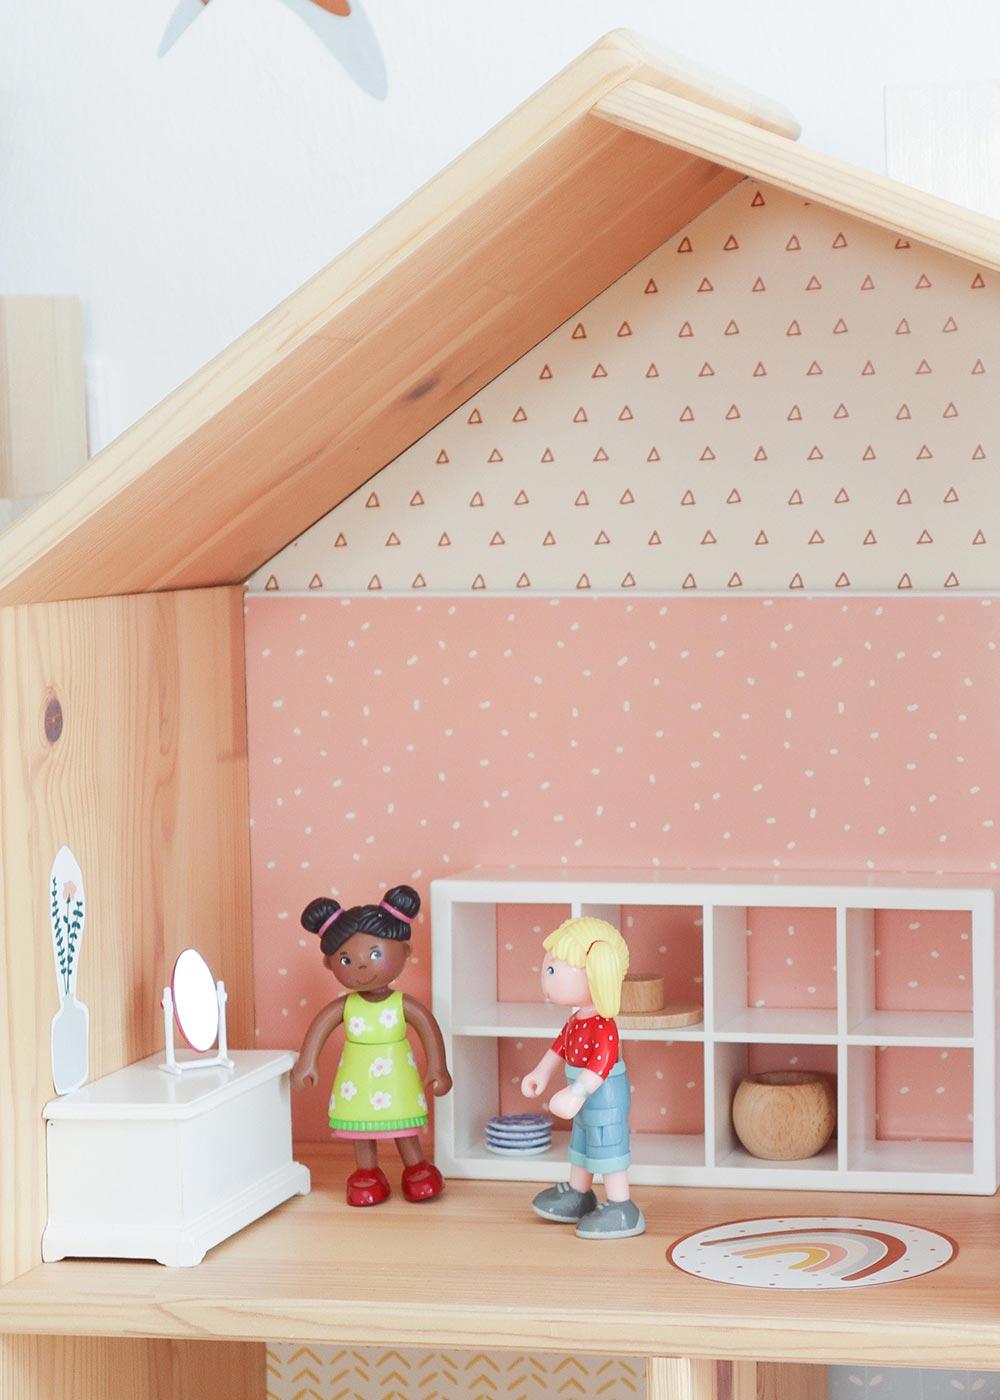 Ikea Flisat Puppenhaus Tapete Lille Stuba rosa camel Teilansicht